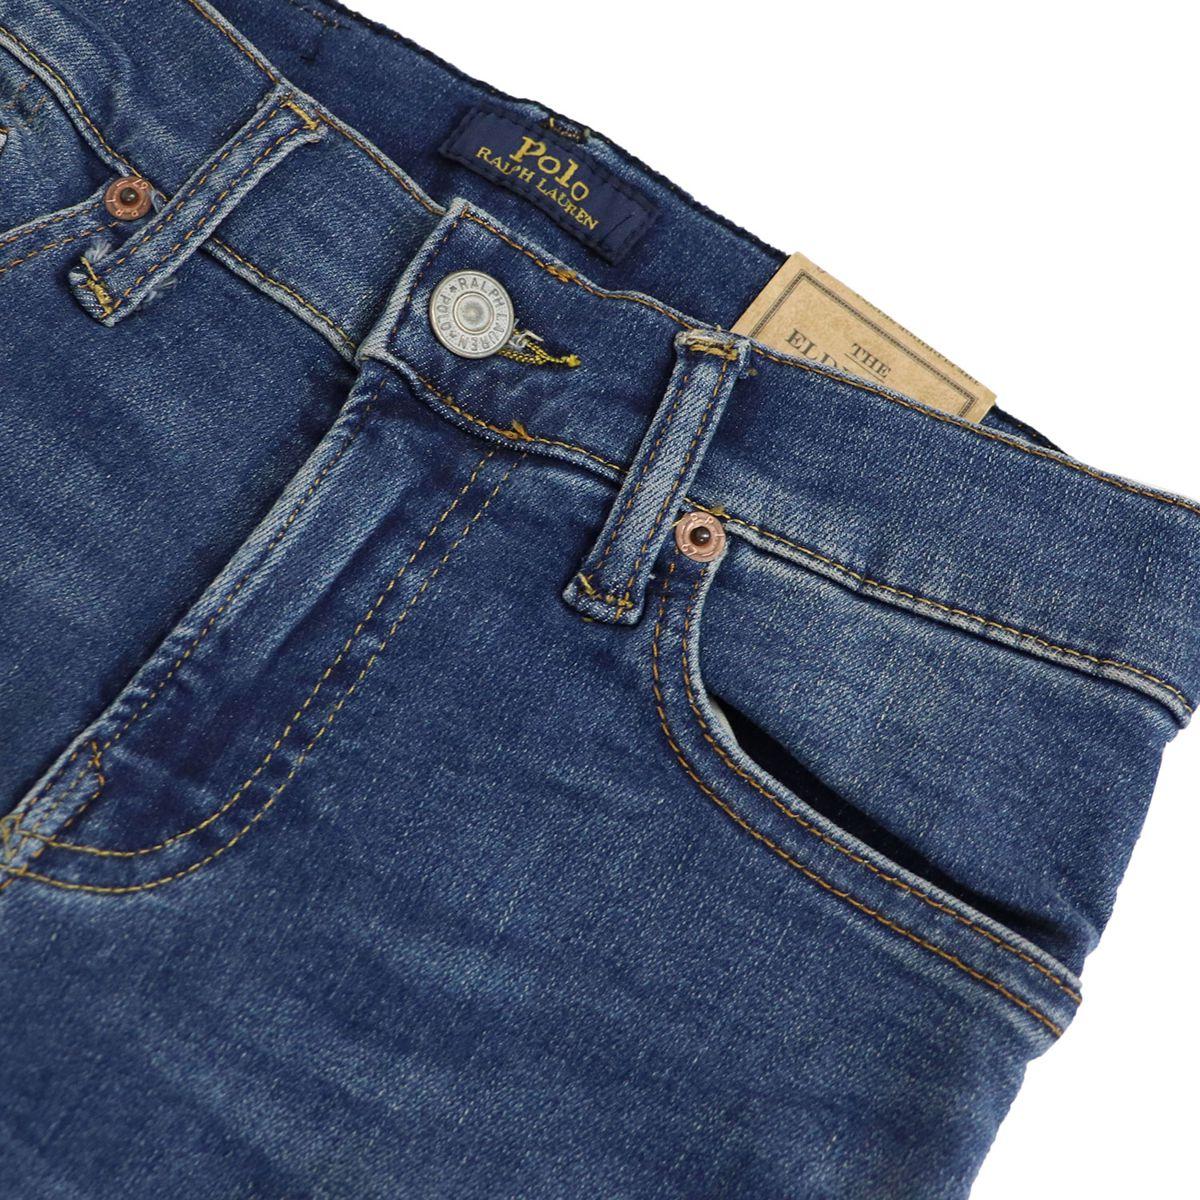 5-pocket used denim jeans Medium denim Polo Ralph Lauren